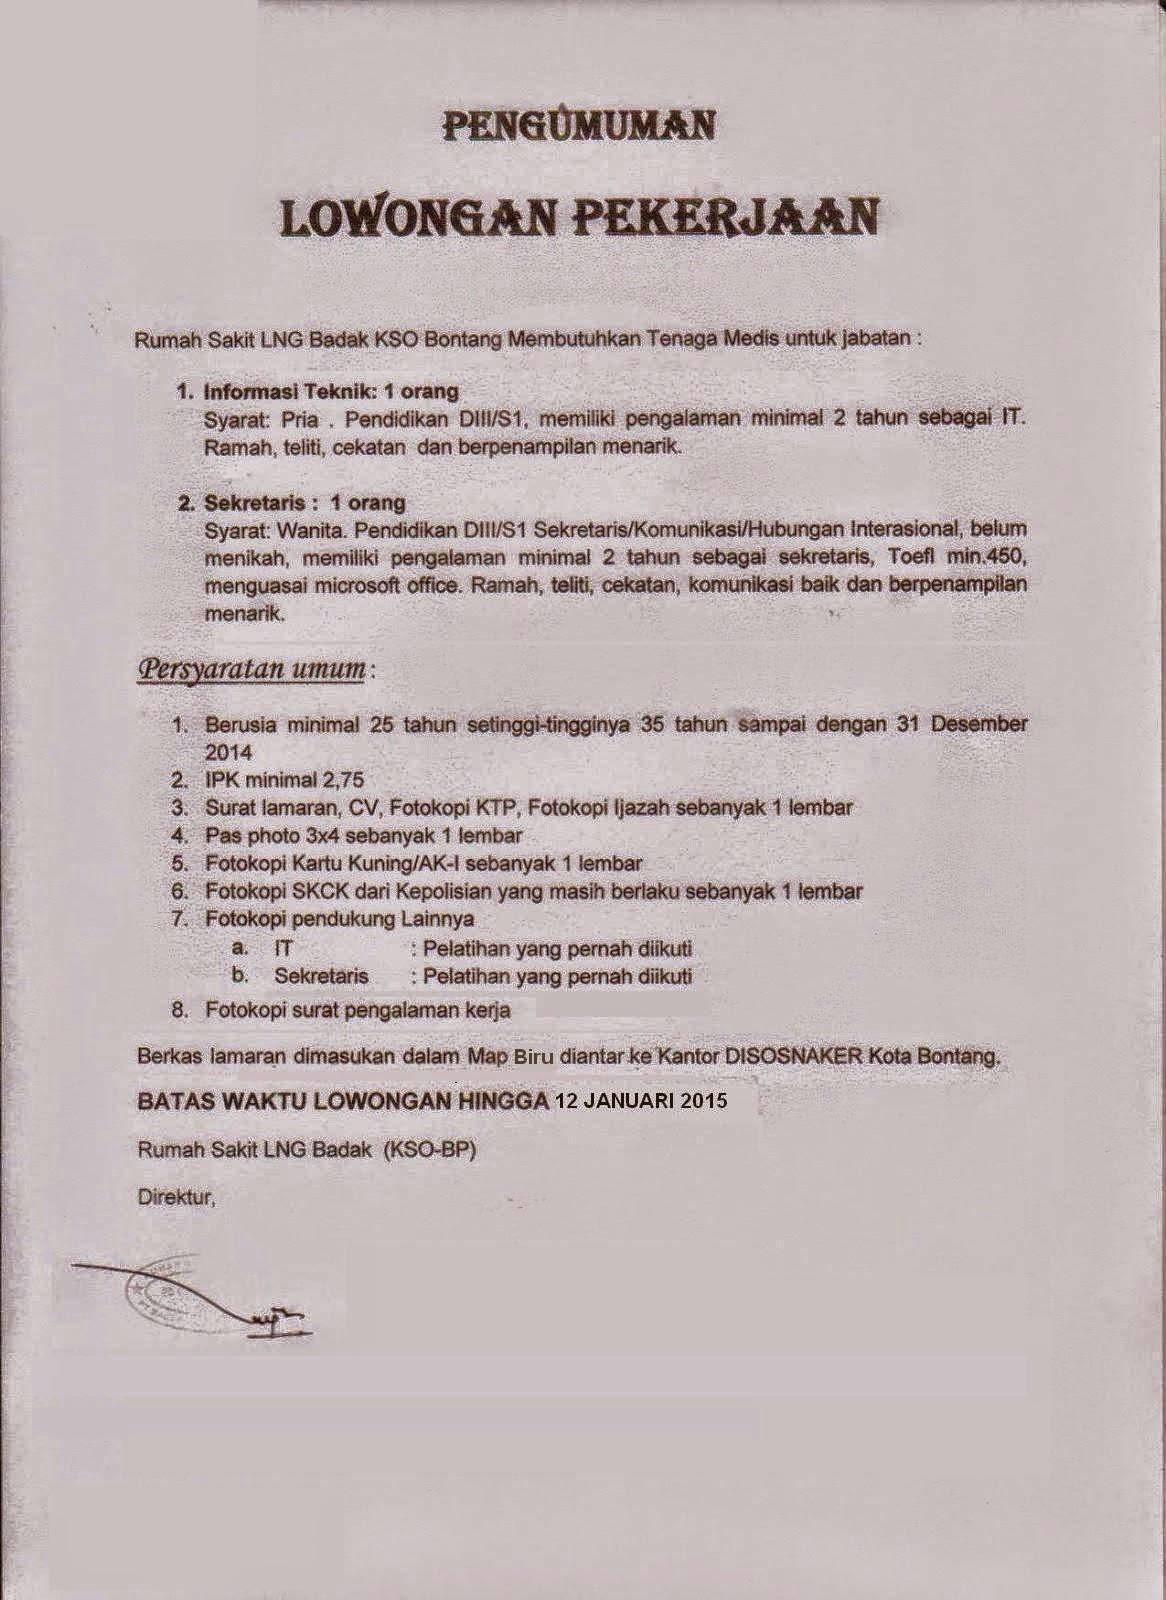 Lowongan Kerja Terbaru : Rumah Sakit LNG Badak KSO Bontang